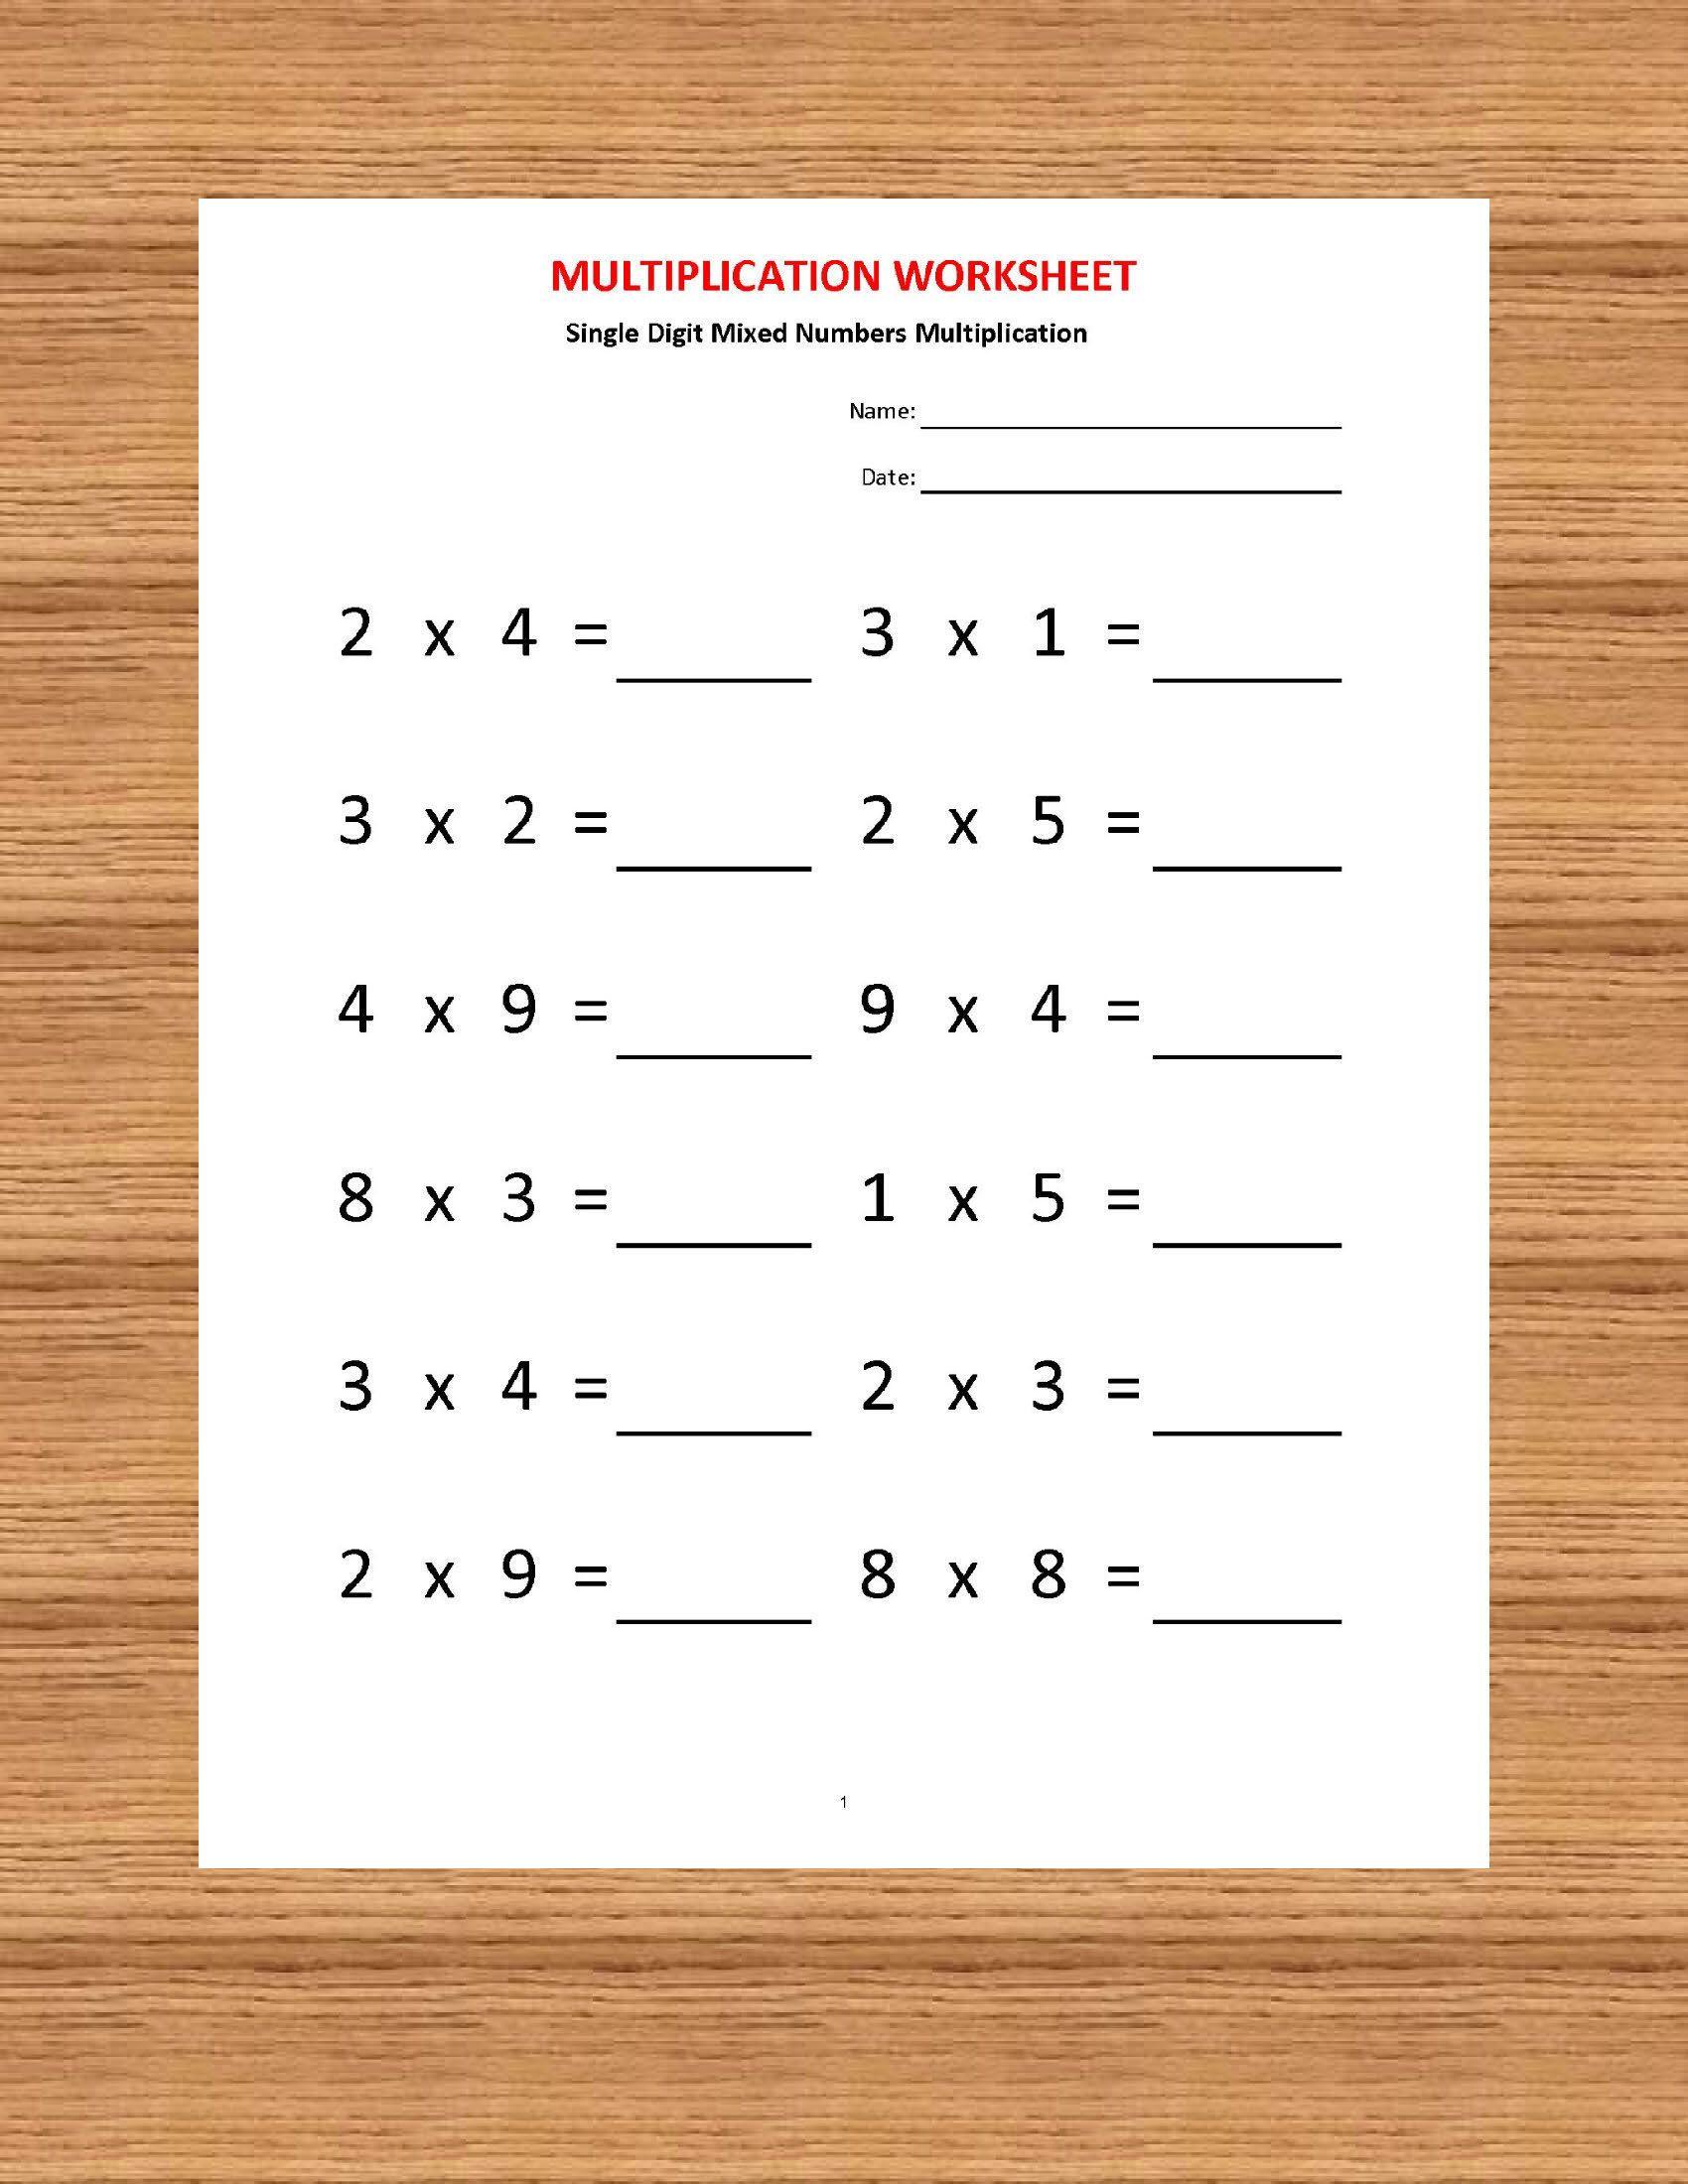 Best Worksheets For Kids Page 8 | Worksheets Ideas